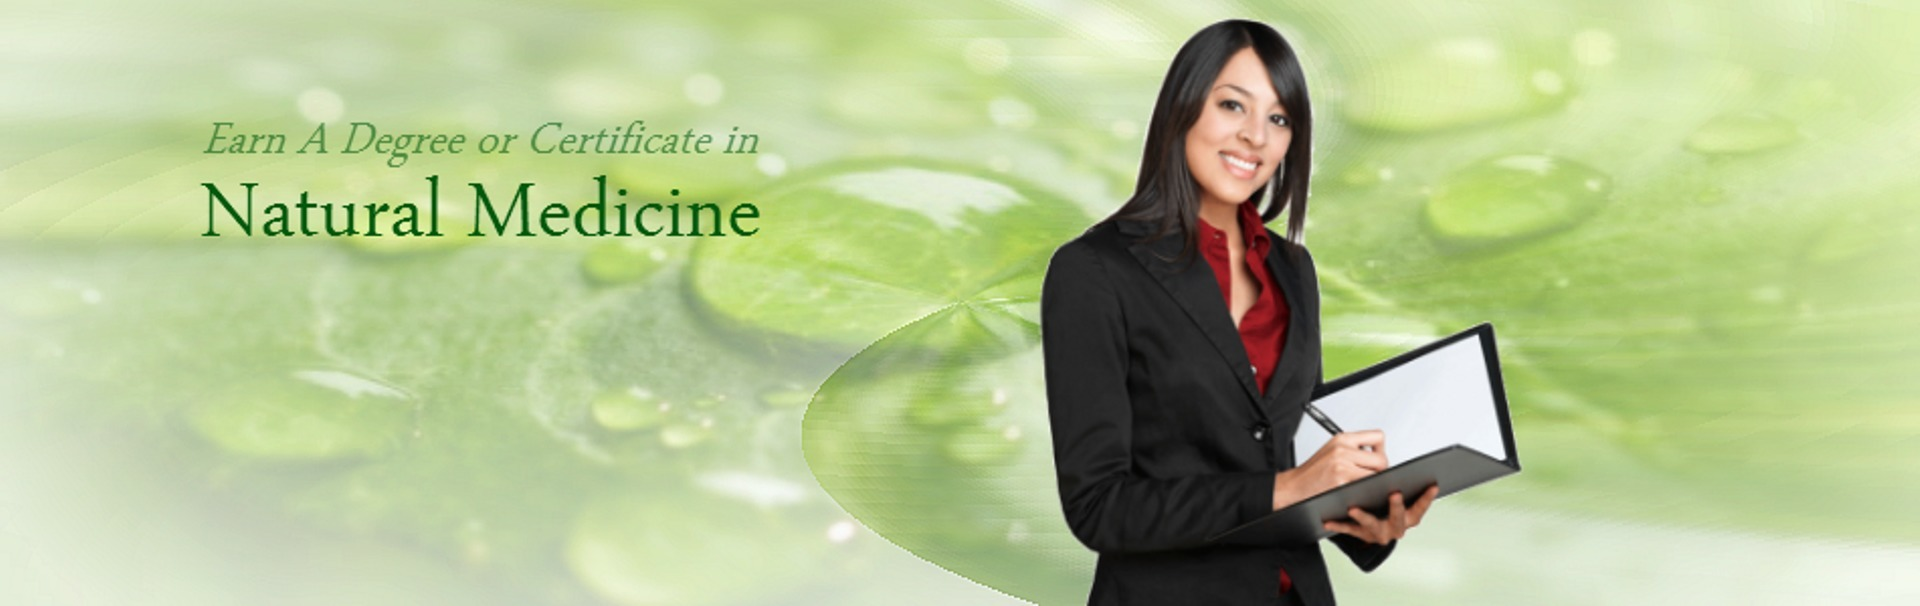 New Eden School of Natural Health and Herbal Studi (@newedenschoolofnaturalhealth) Cover Image